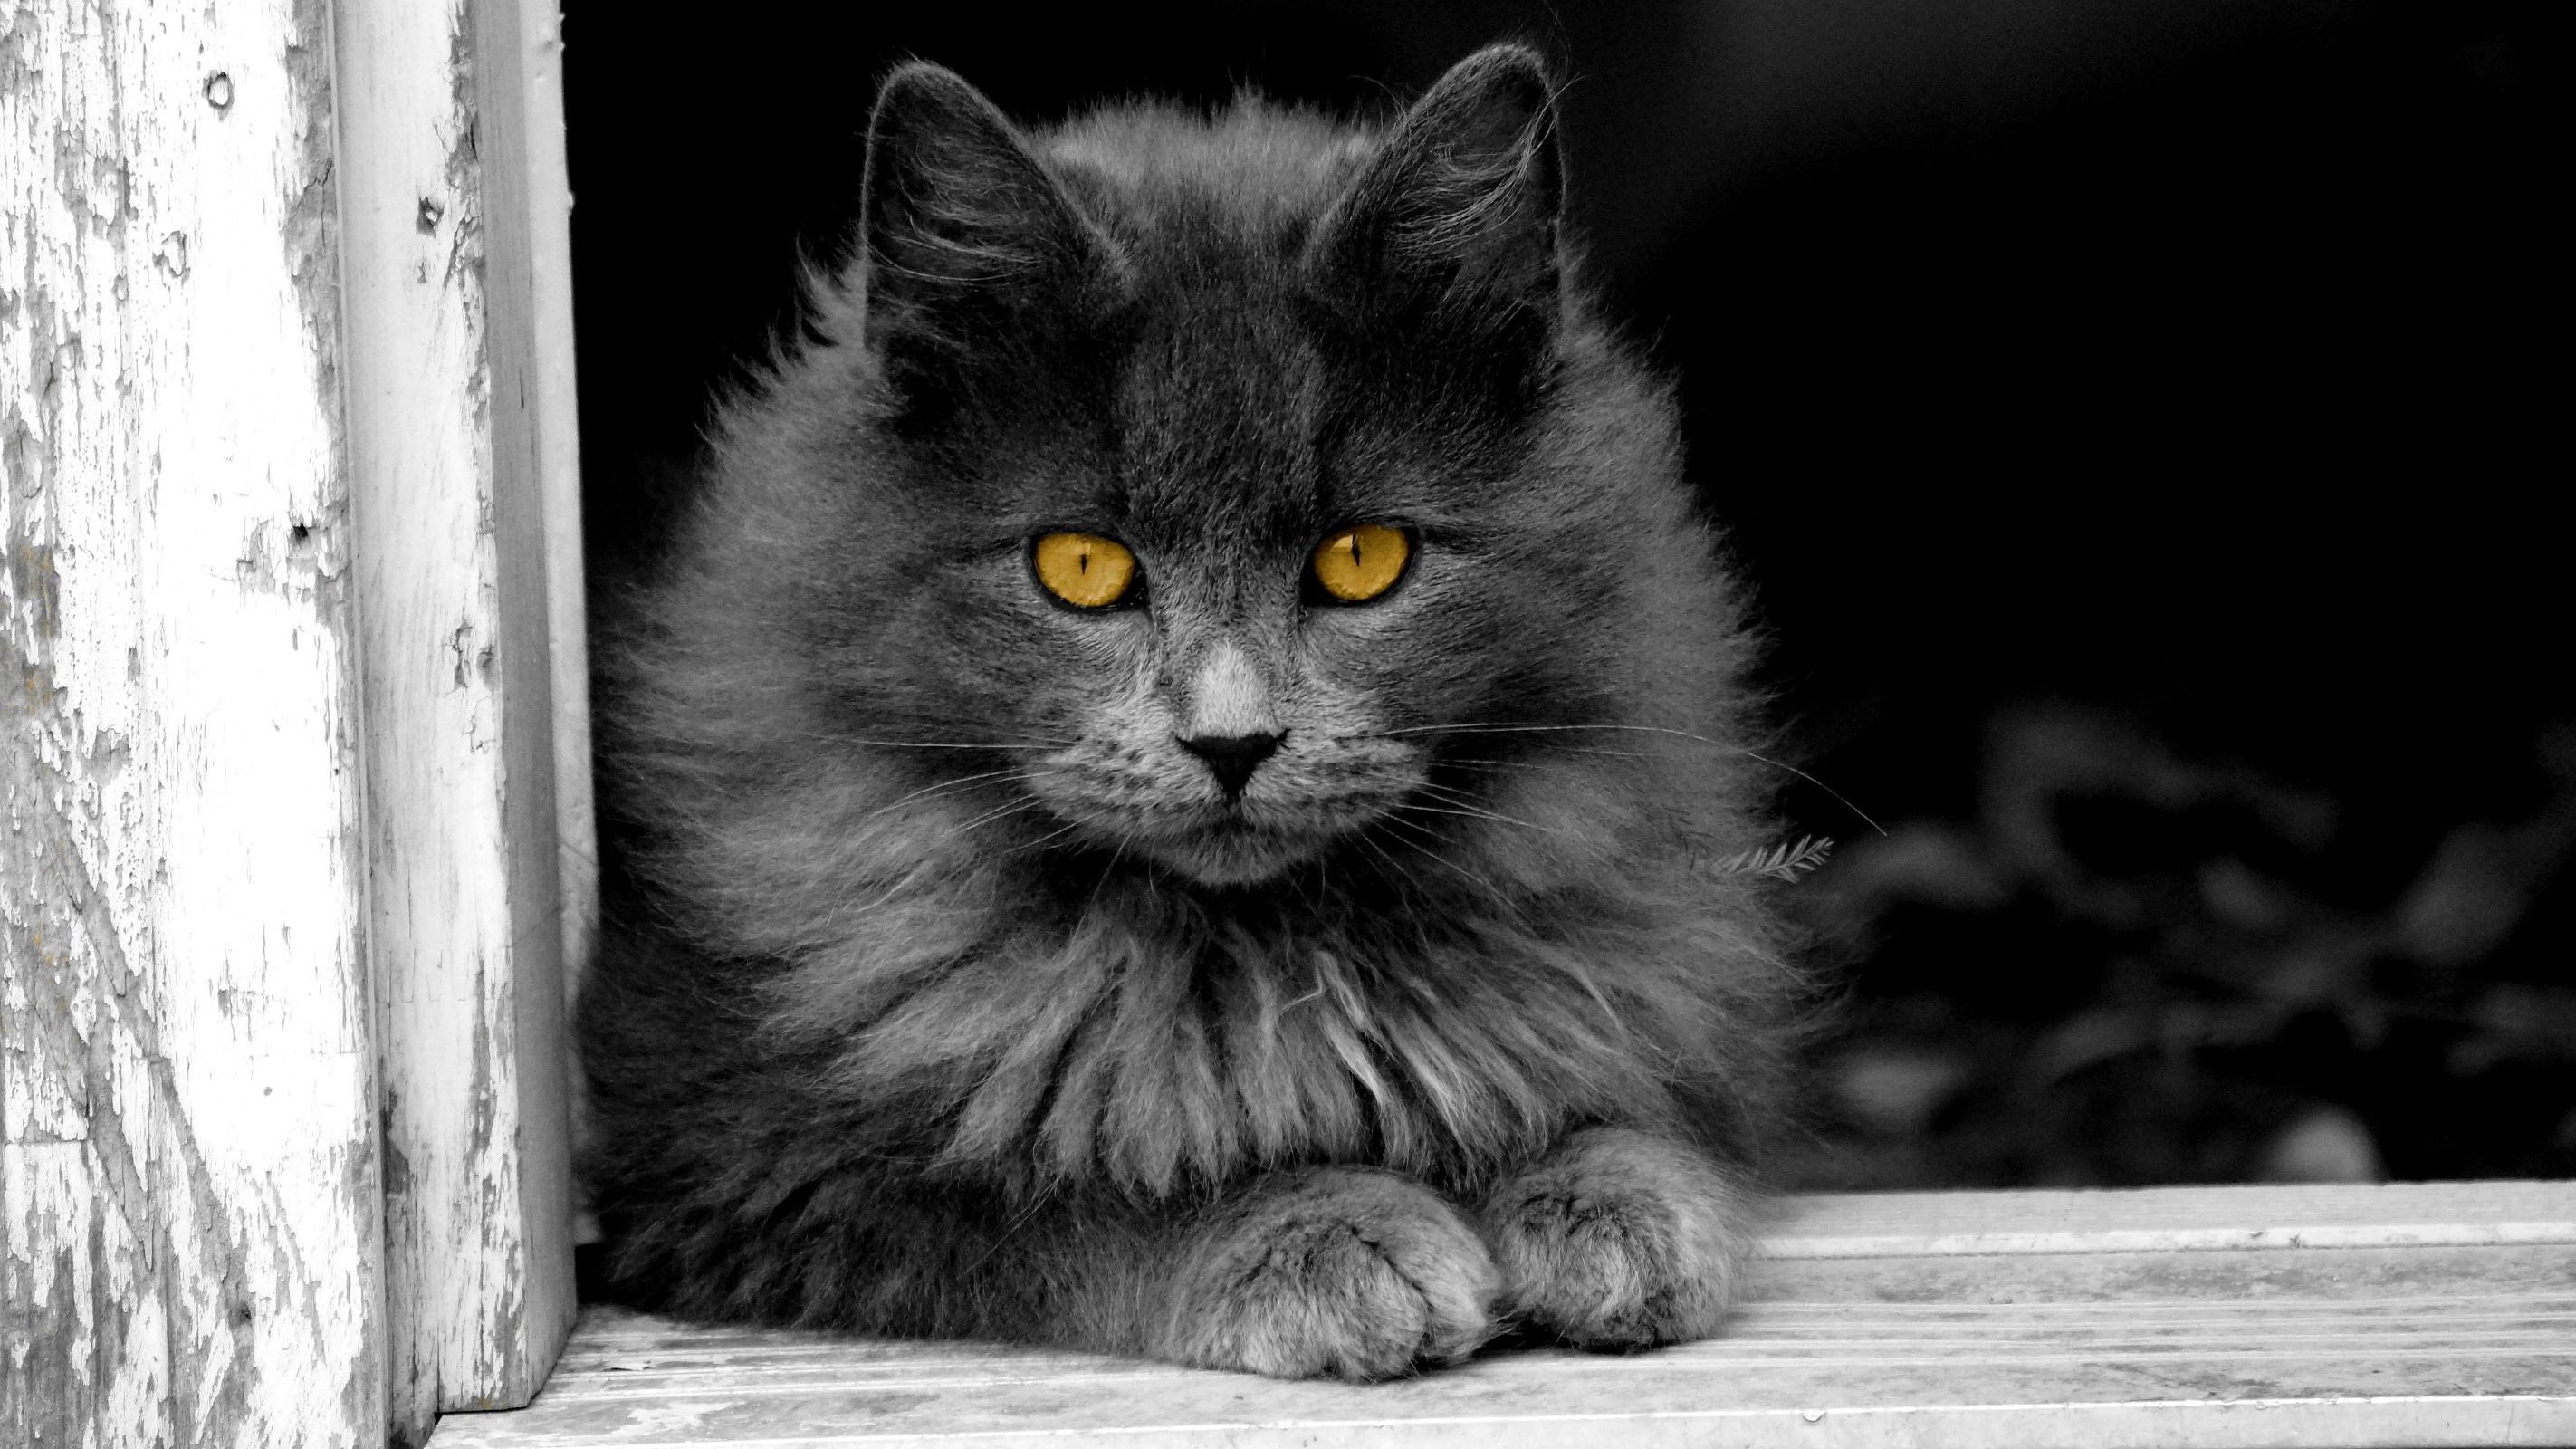 960+ Gambar Hewan Kucing Mewarnai Gratis